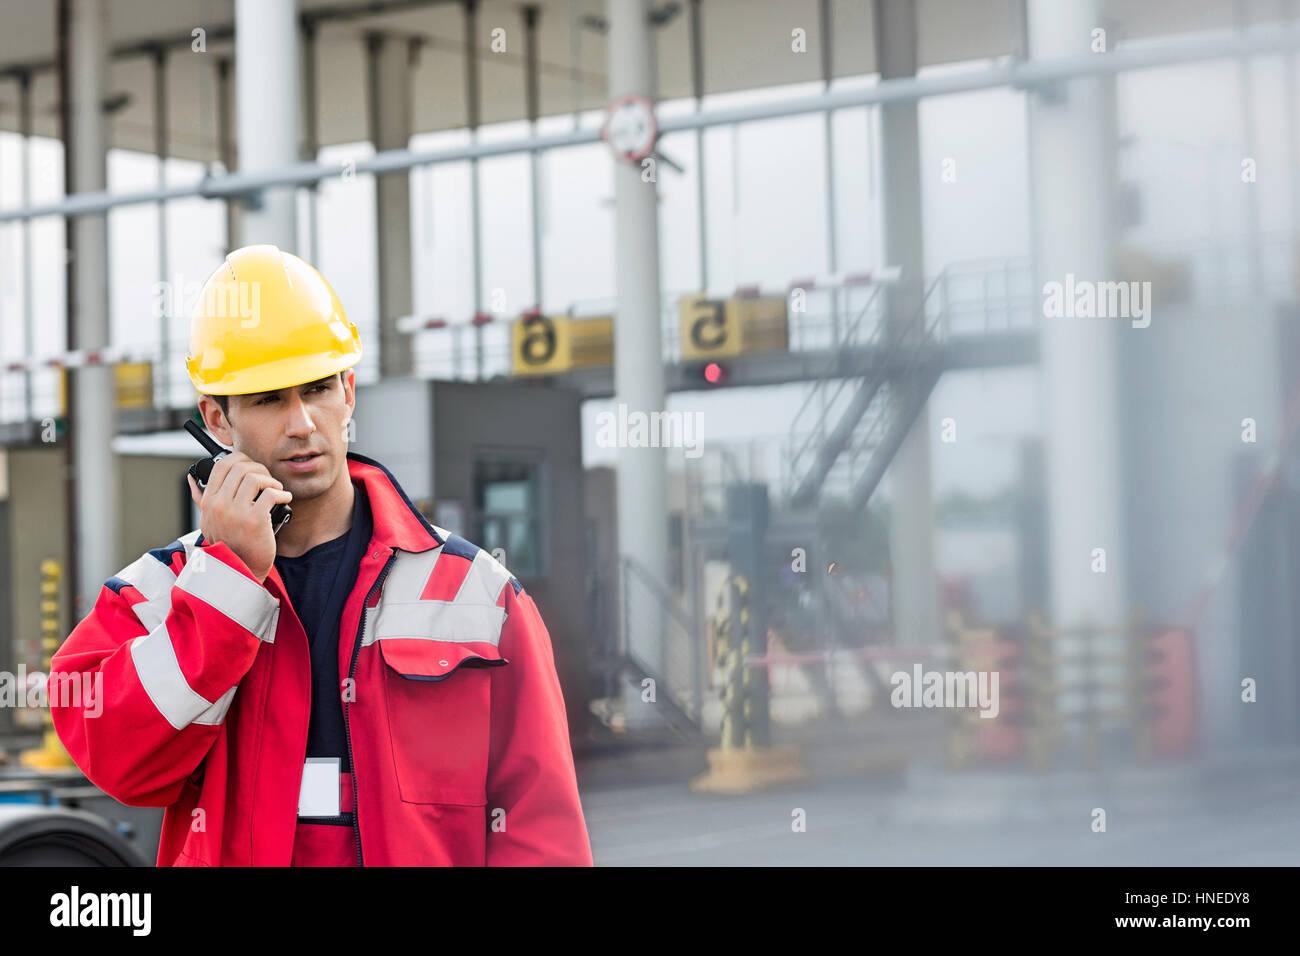 Male worker using walkie-talkie in shipping yard - Stock Image